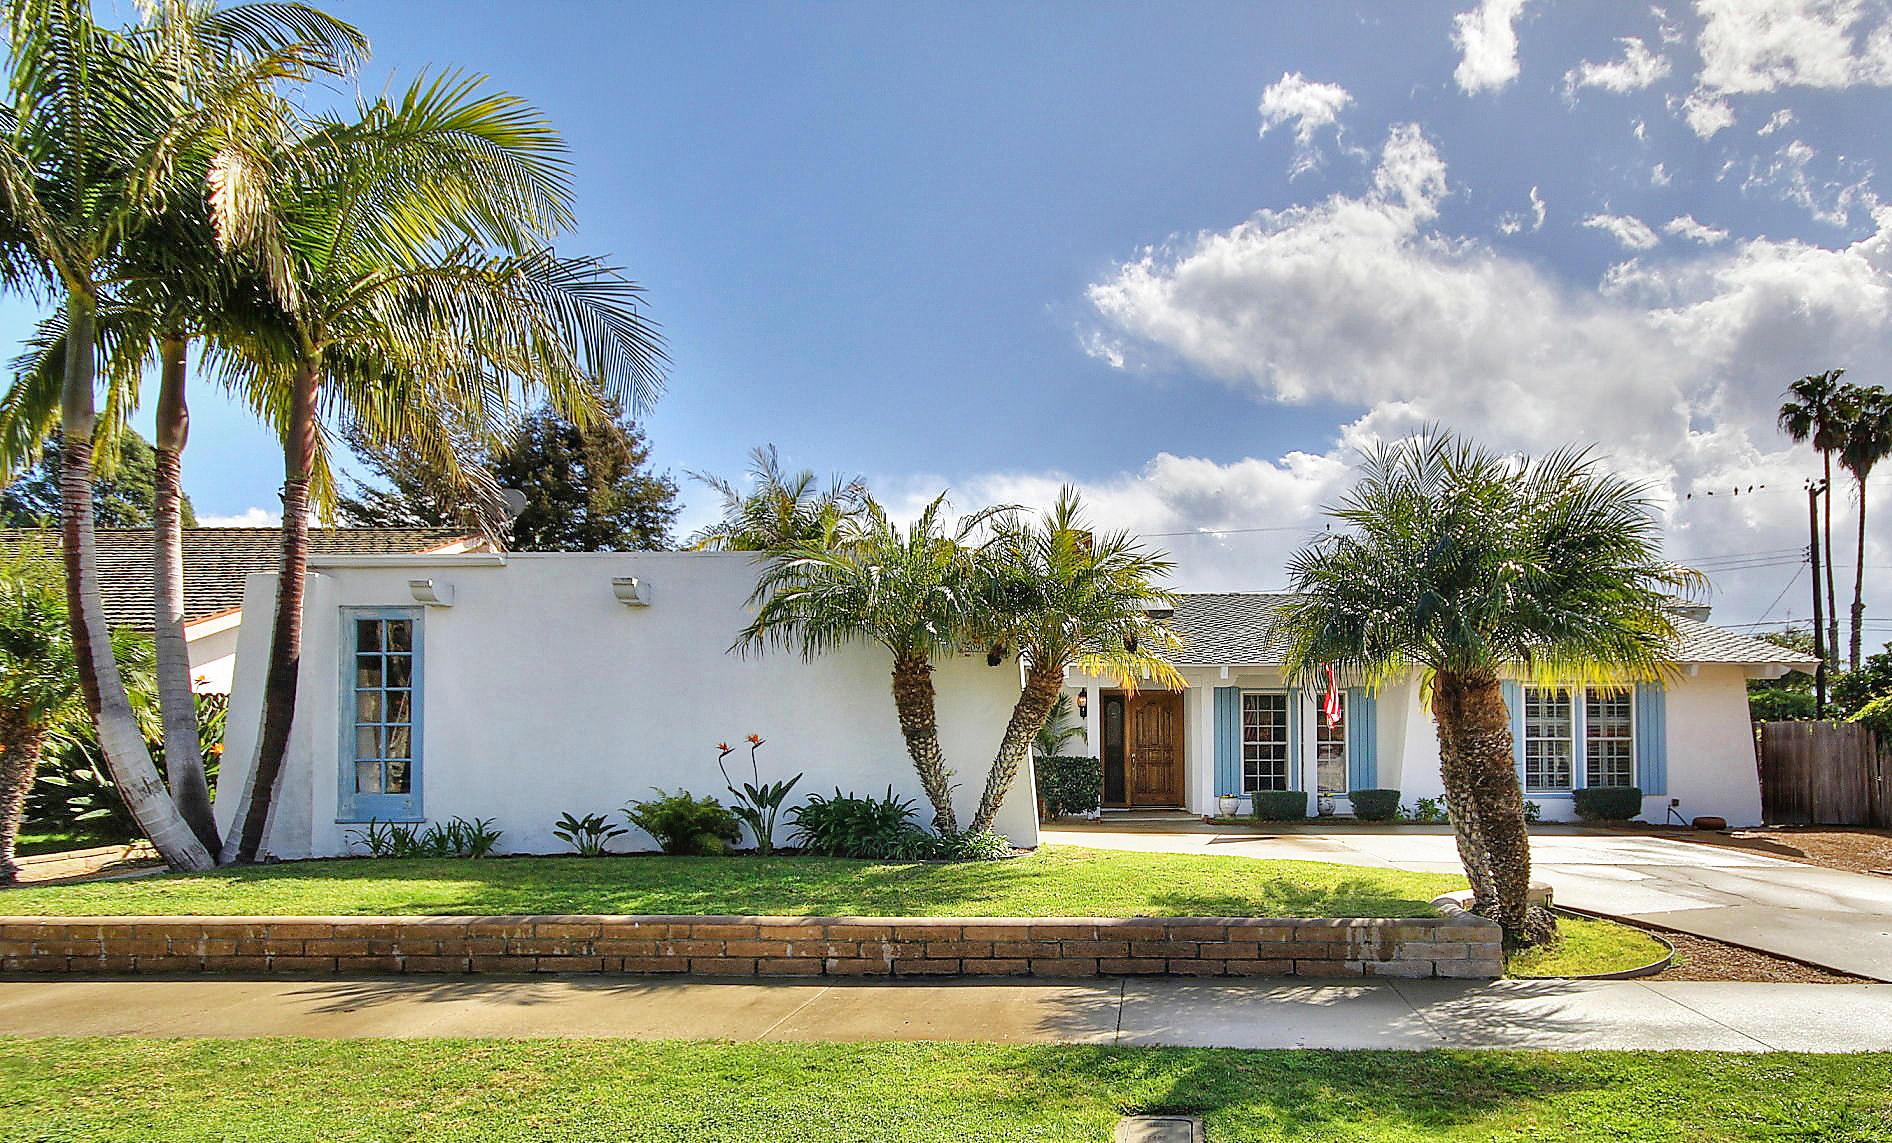 Property photo for 5091 Parkwood Pl Santa Barbara, California 93111 - 15-620